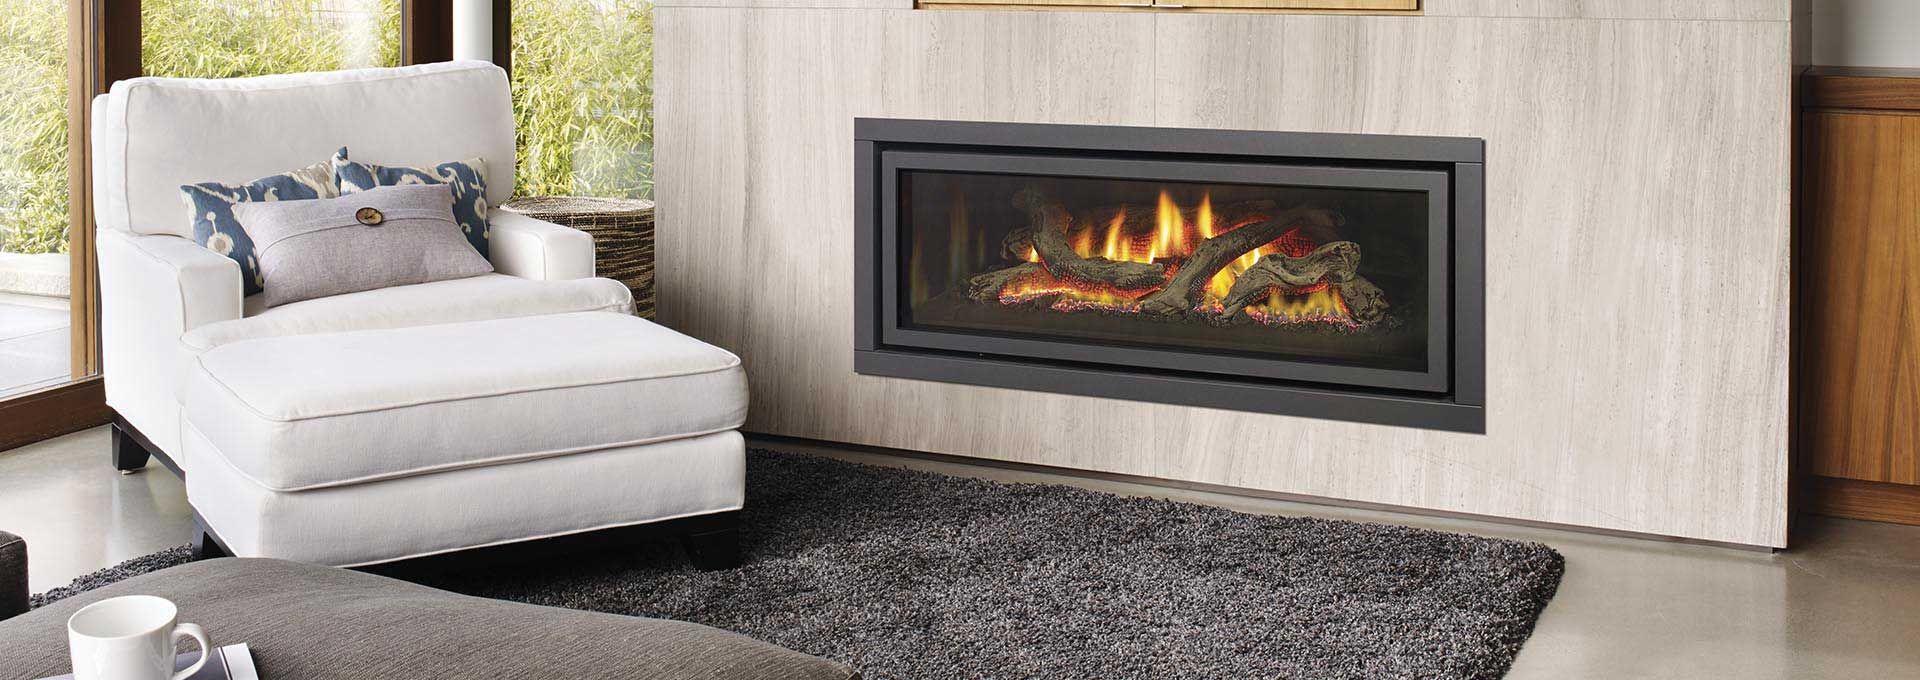 Linear Gas Fireplace Ultimate 1500e Regency Fireplace Products